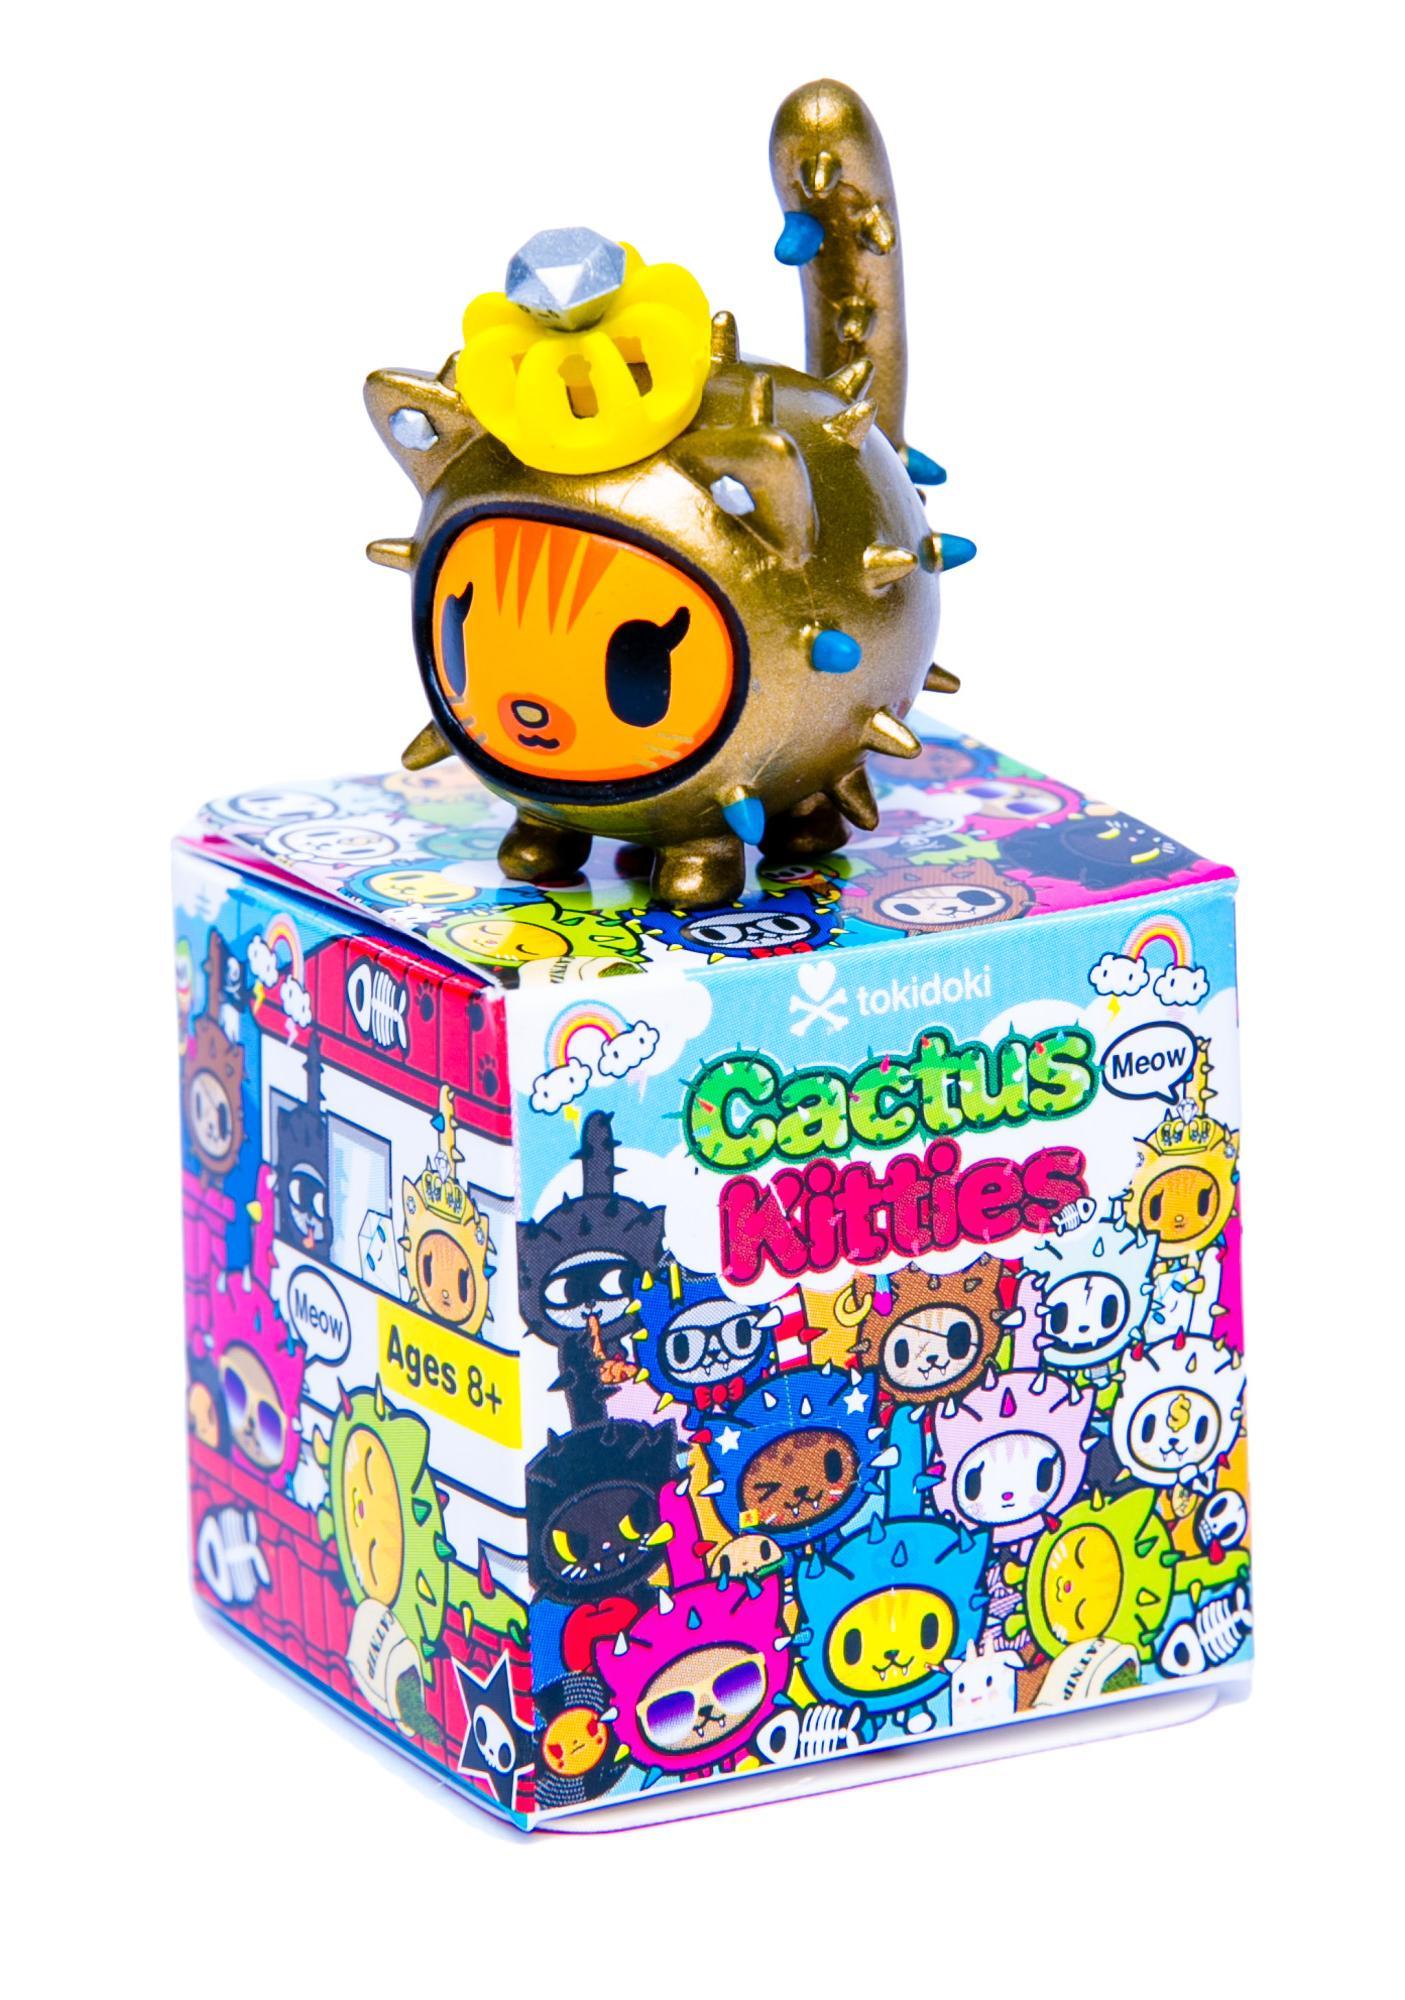 Tokidoki Cactus Kitties | Dolls Kill  Tokidoki Cactus...